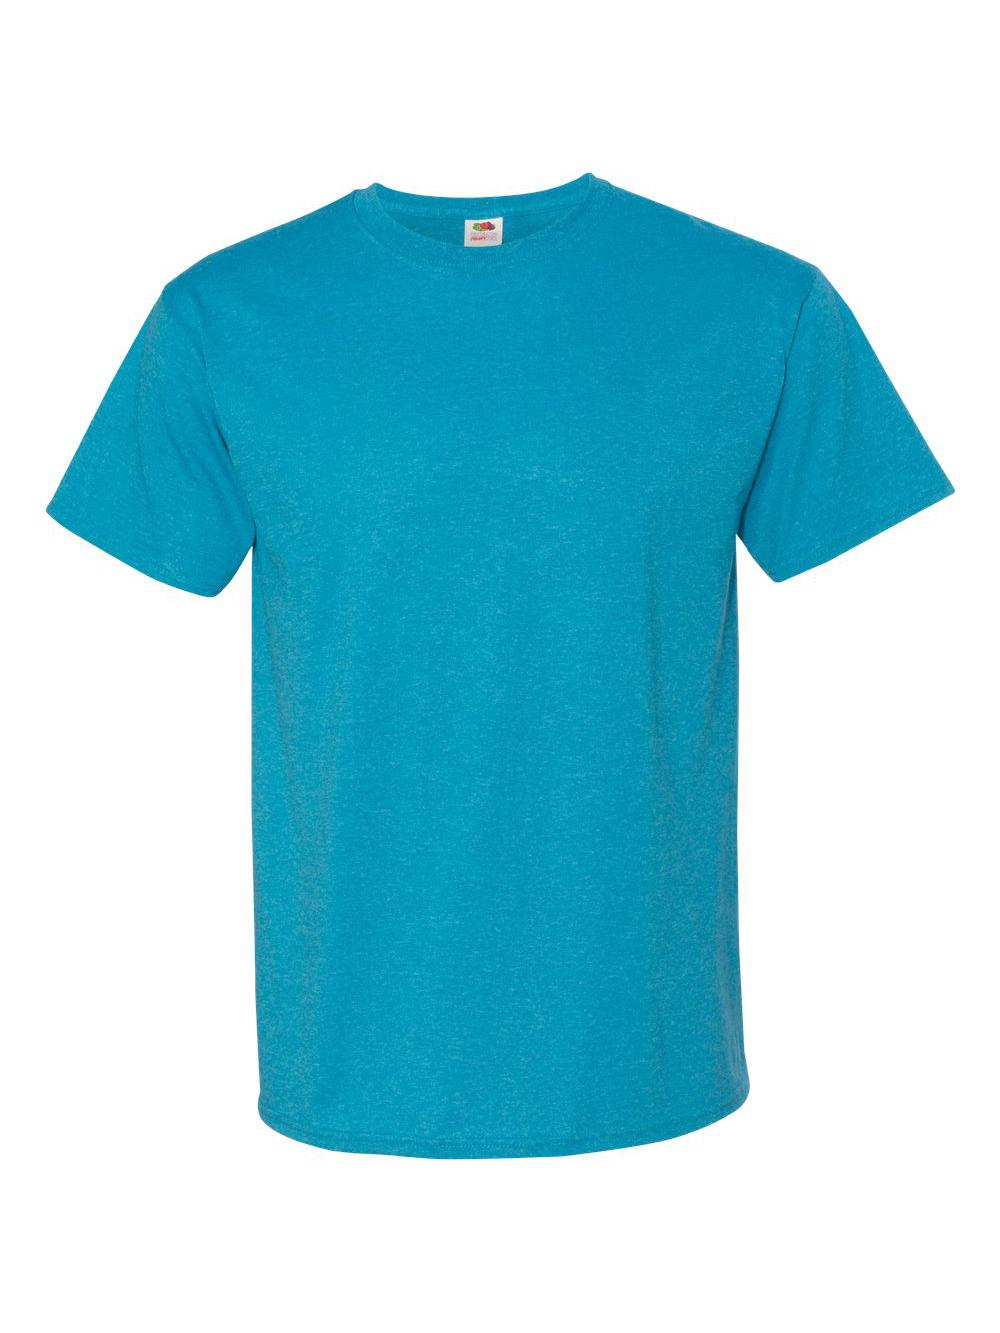 Fruit-of-the-Loom-HD-Cotton-Short-Sleeve-T-Shirt-3930R thumbnail 135